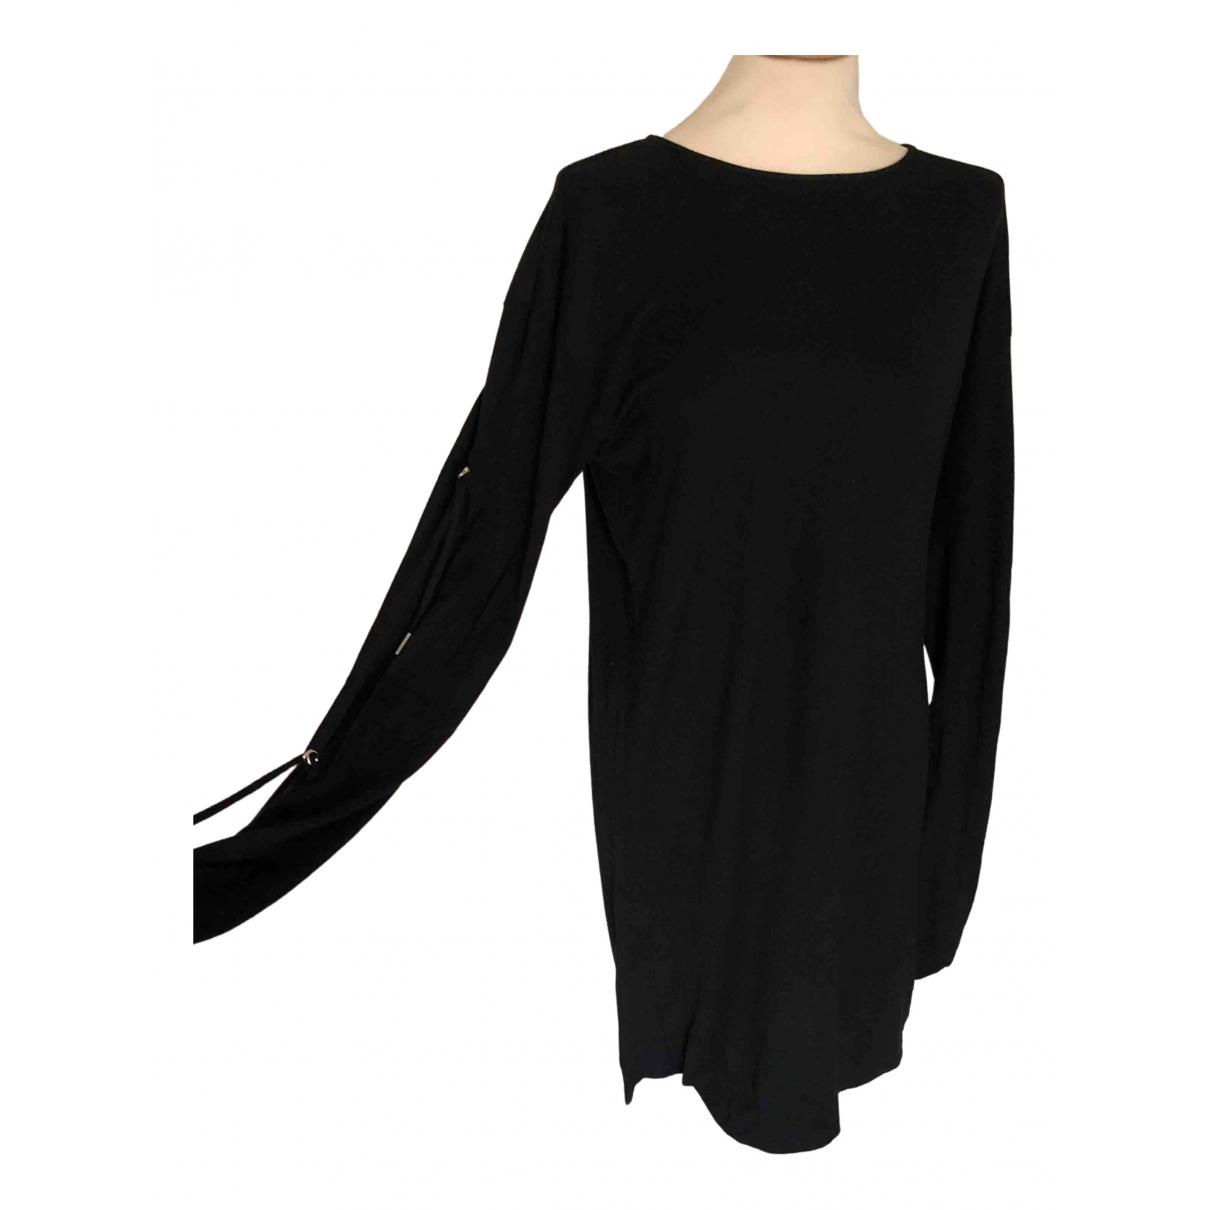 Isabel Marant \N Black Cotton dress for Women 38 FR